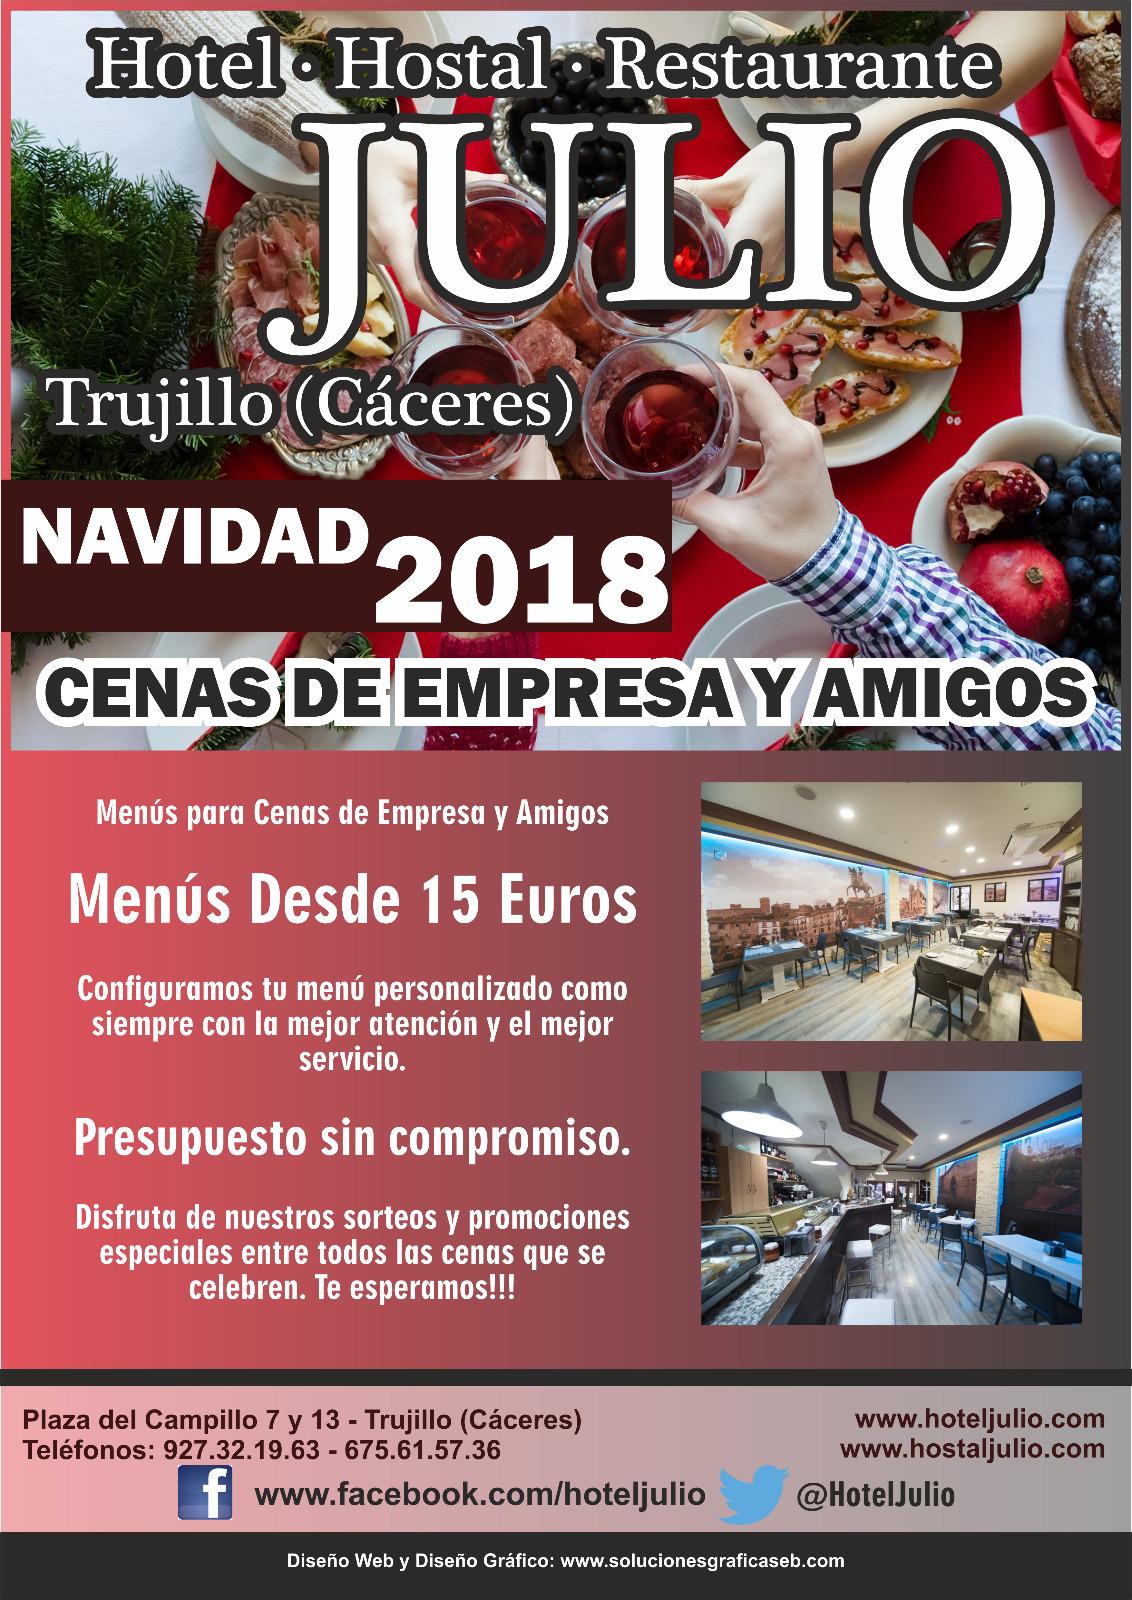 Cenas de empresa Trujillo Hostal Restaurante Julio